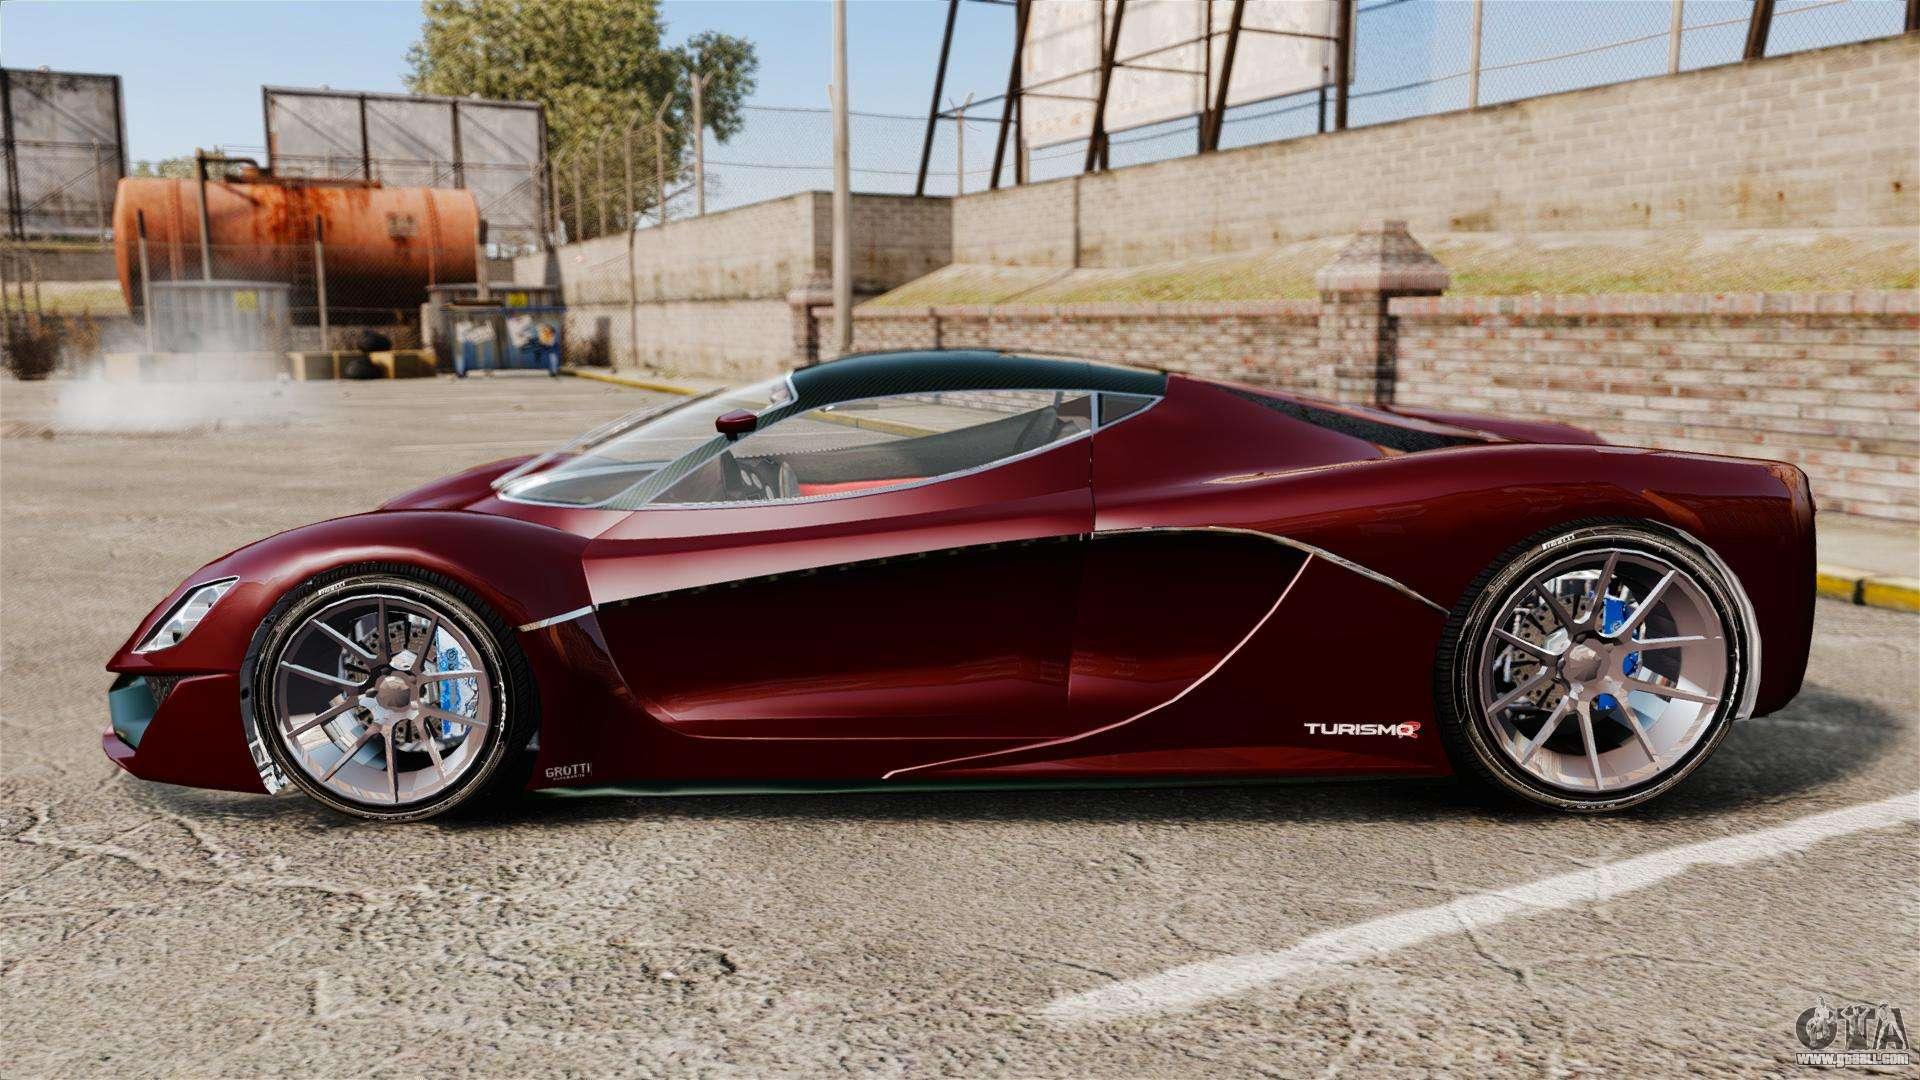 Turismo Car: GTA V Grotti Turismo R V2.0 For GTA 4